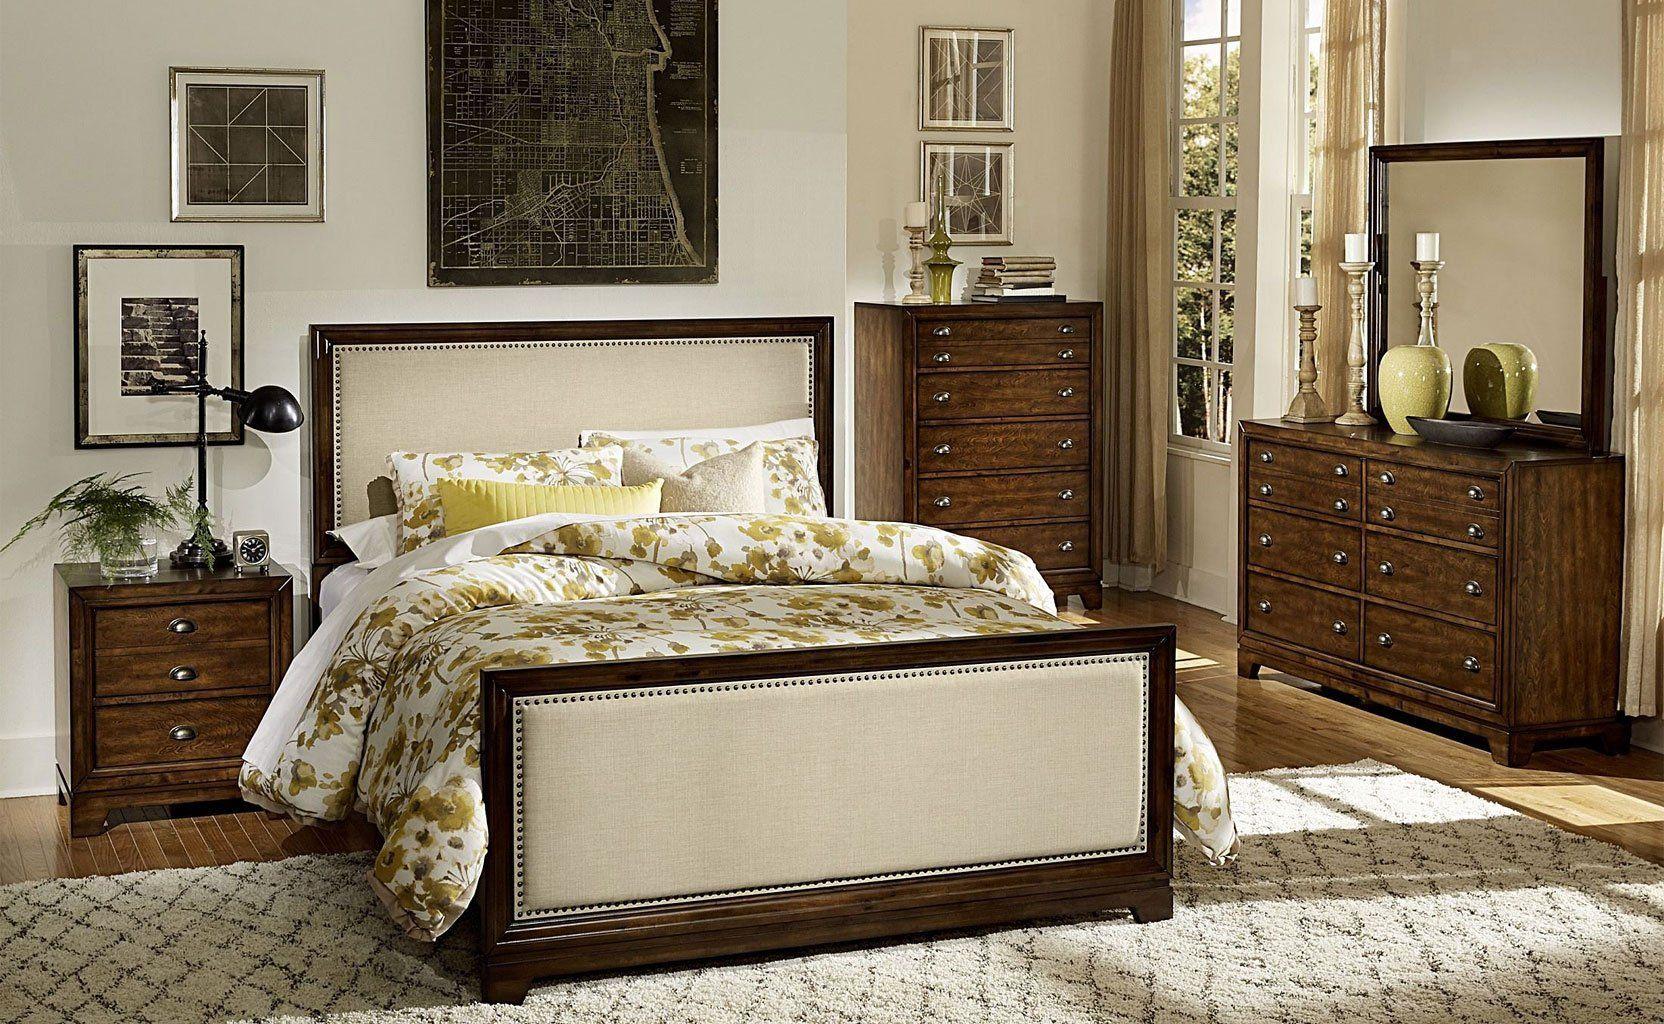 Bernal Heights Panel Bedroom Set Upholstered Headboards Bedroom Nailhead Trim Bed Fabric Headboard Bedroom